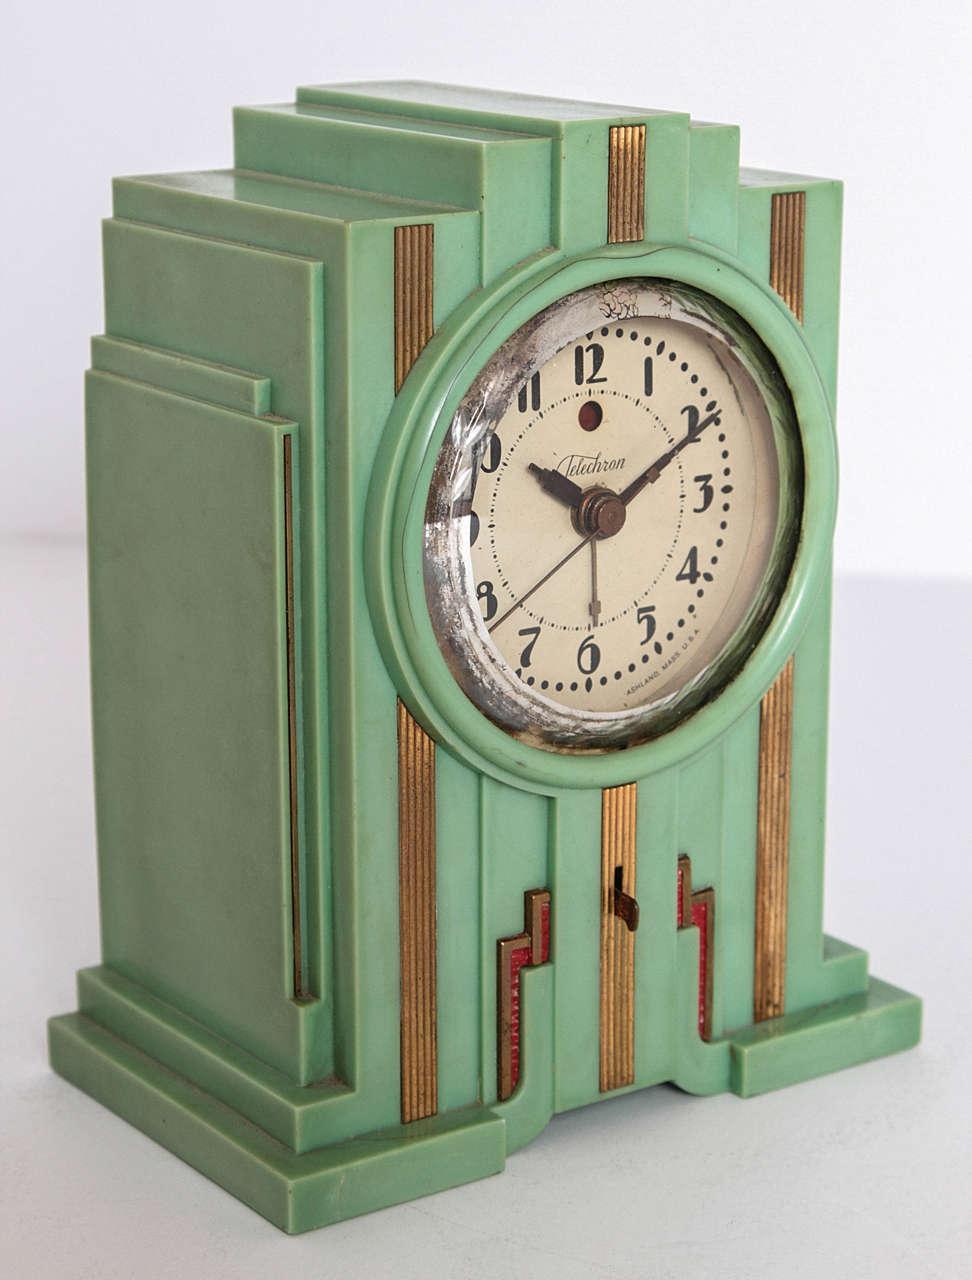 Telechron Skyscraper Art Deco Plaskon Pair Clocks In